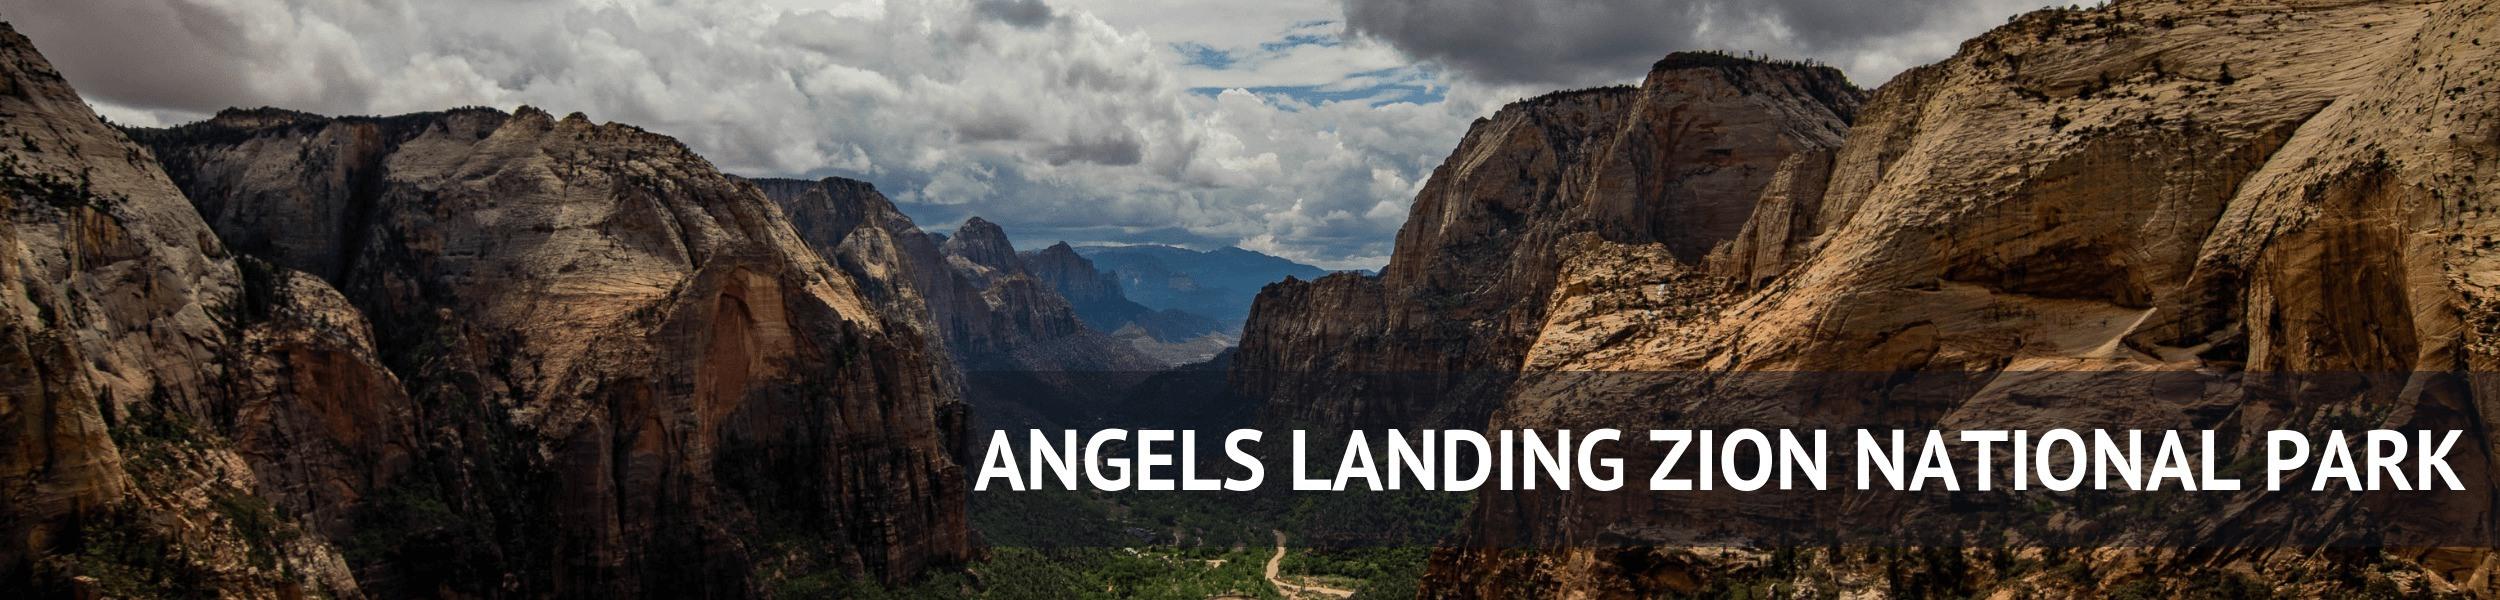 Hiking Angels Landing Zion Nation Park Utah